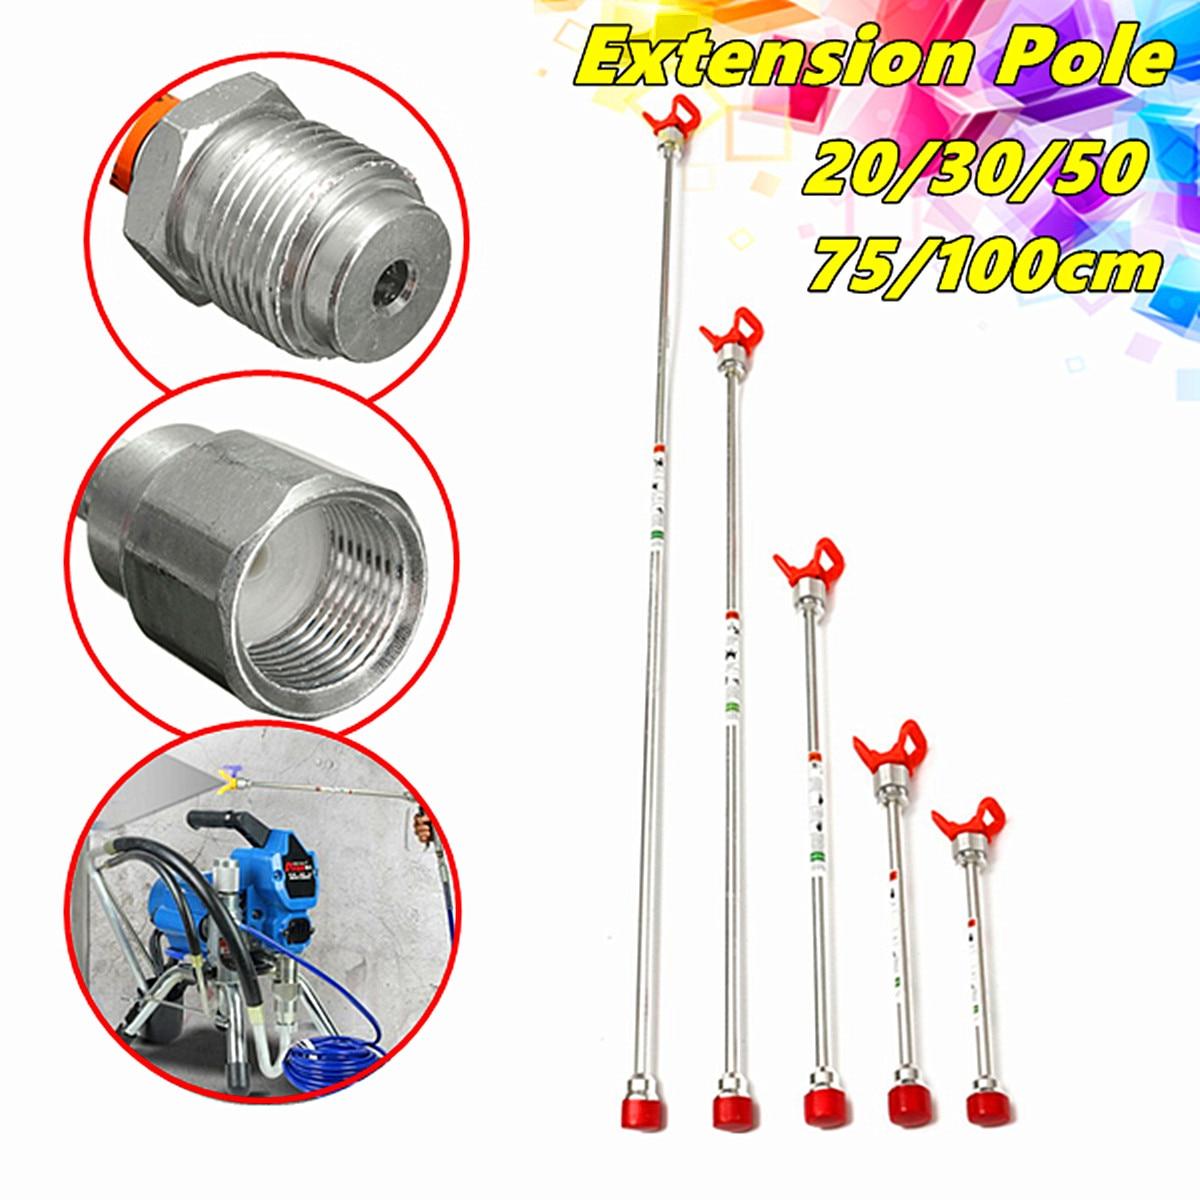 20/30/50/75/100cm Airless Paint Sprayer Spray Guns Tip Extension Pole Rod Fits Spray Guns Tool Parts